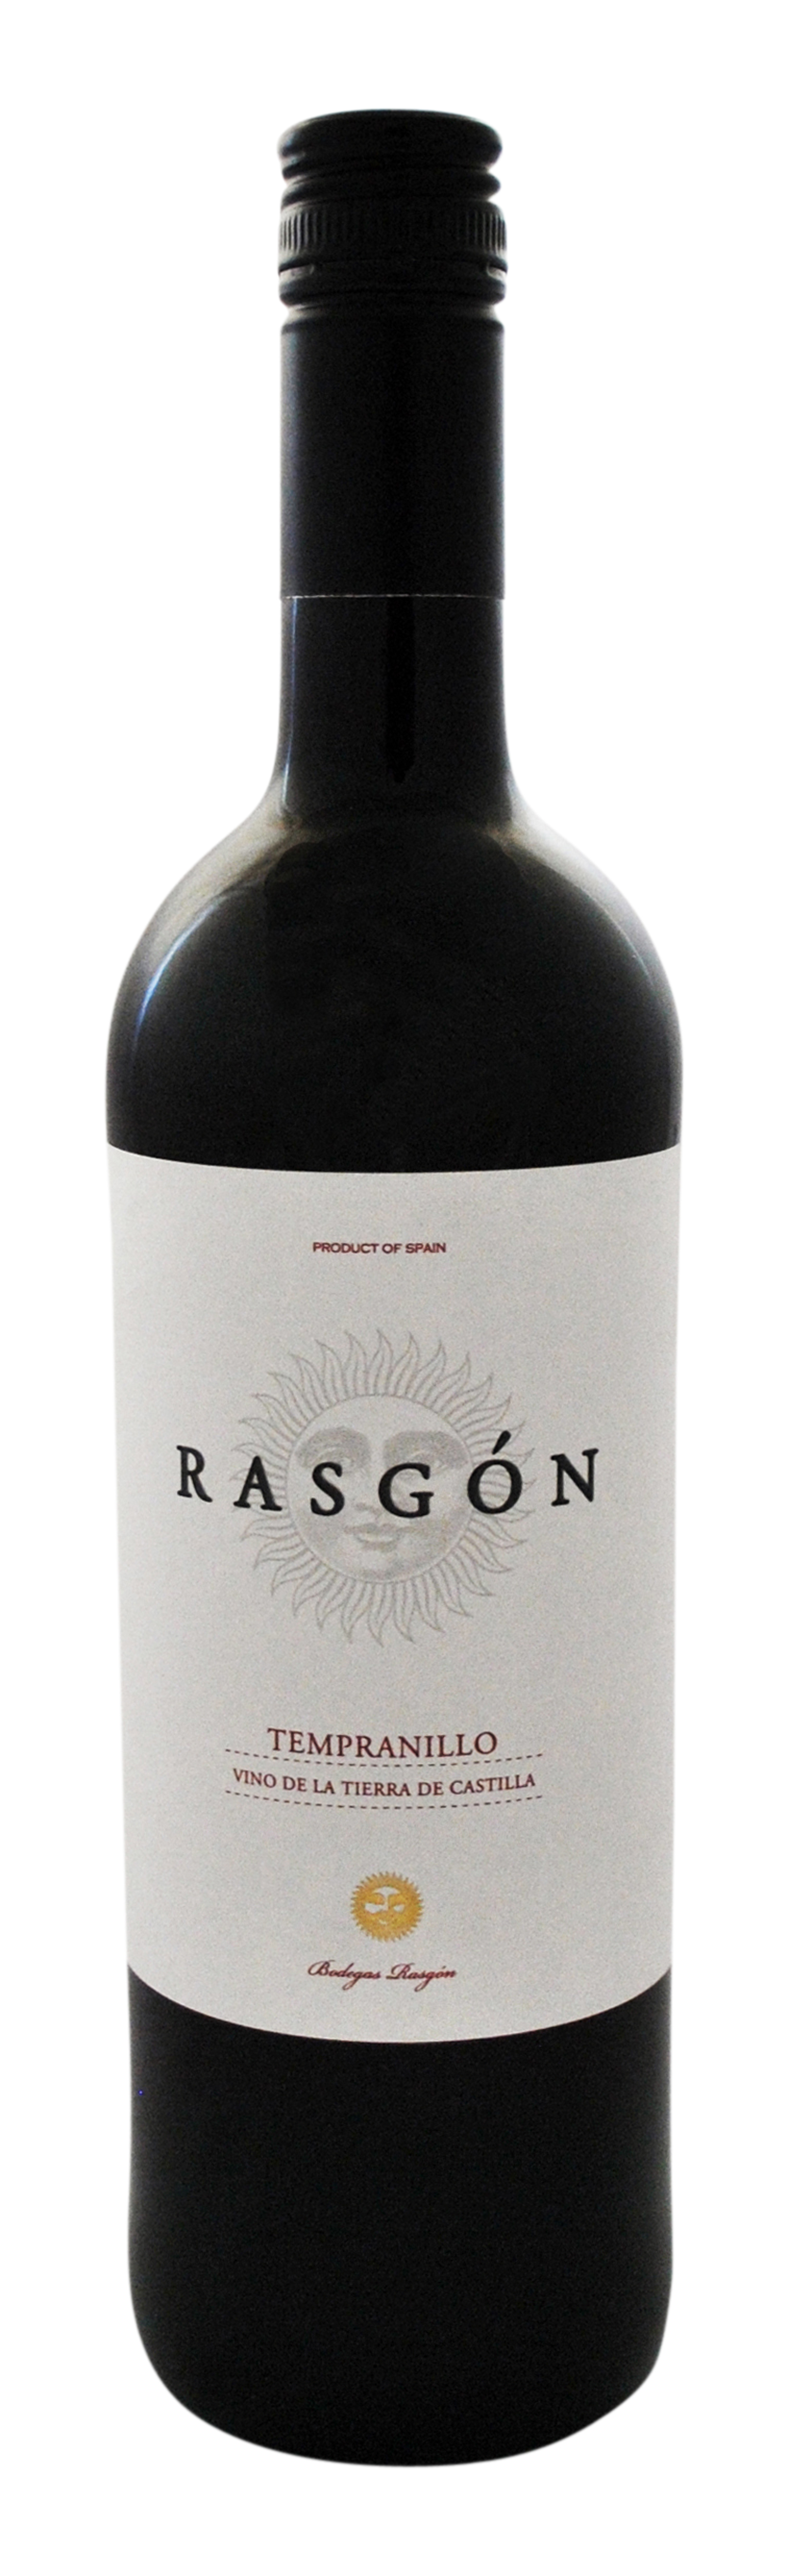 Bodegas Rasgon